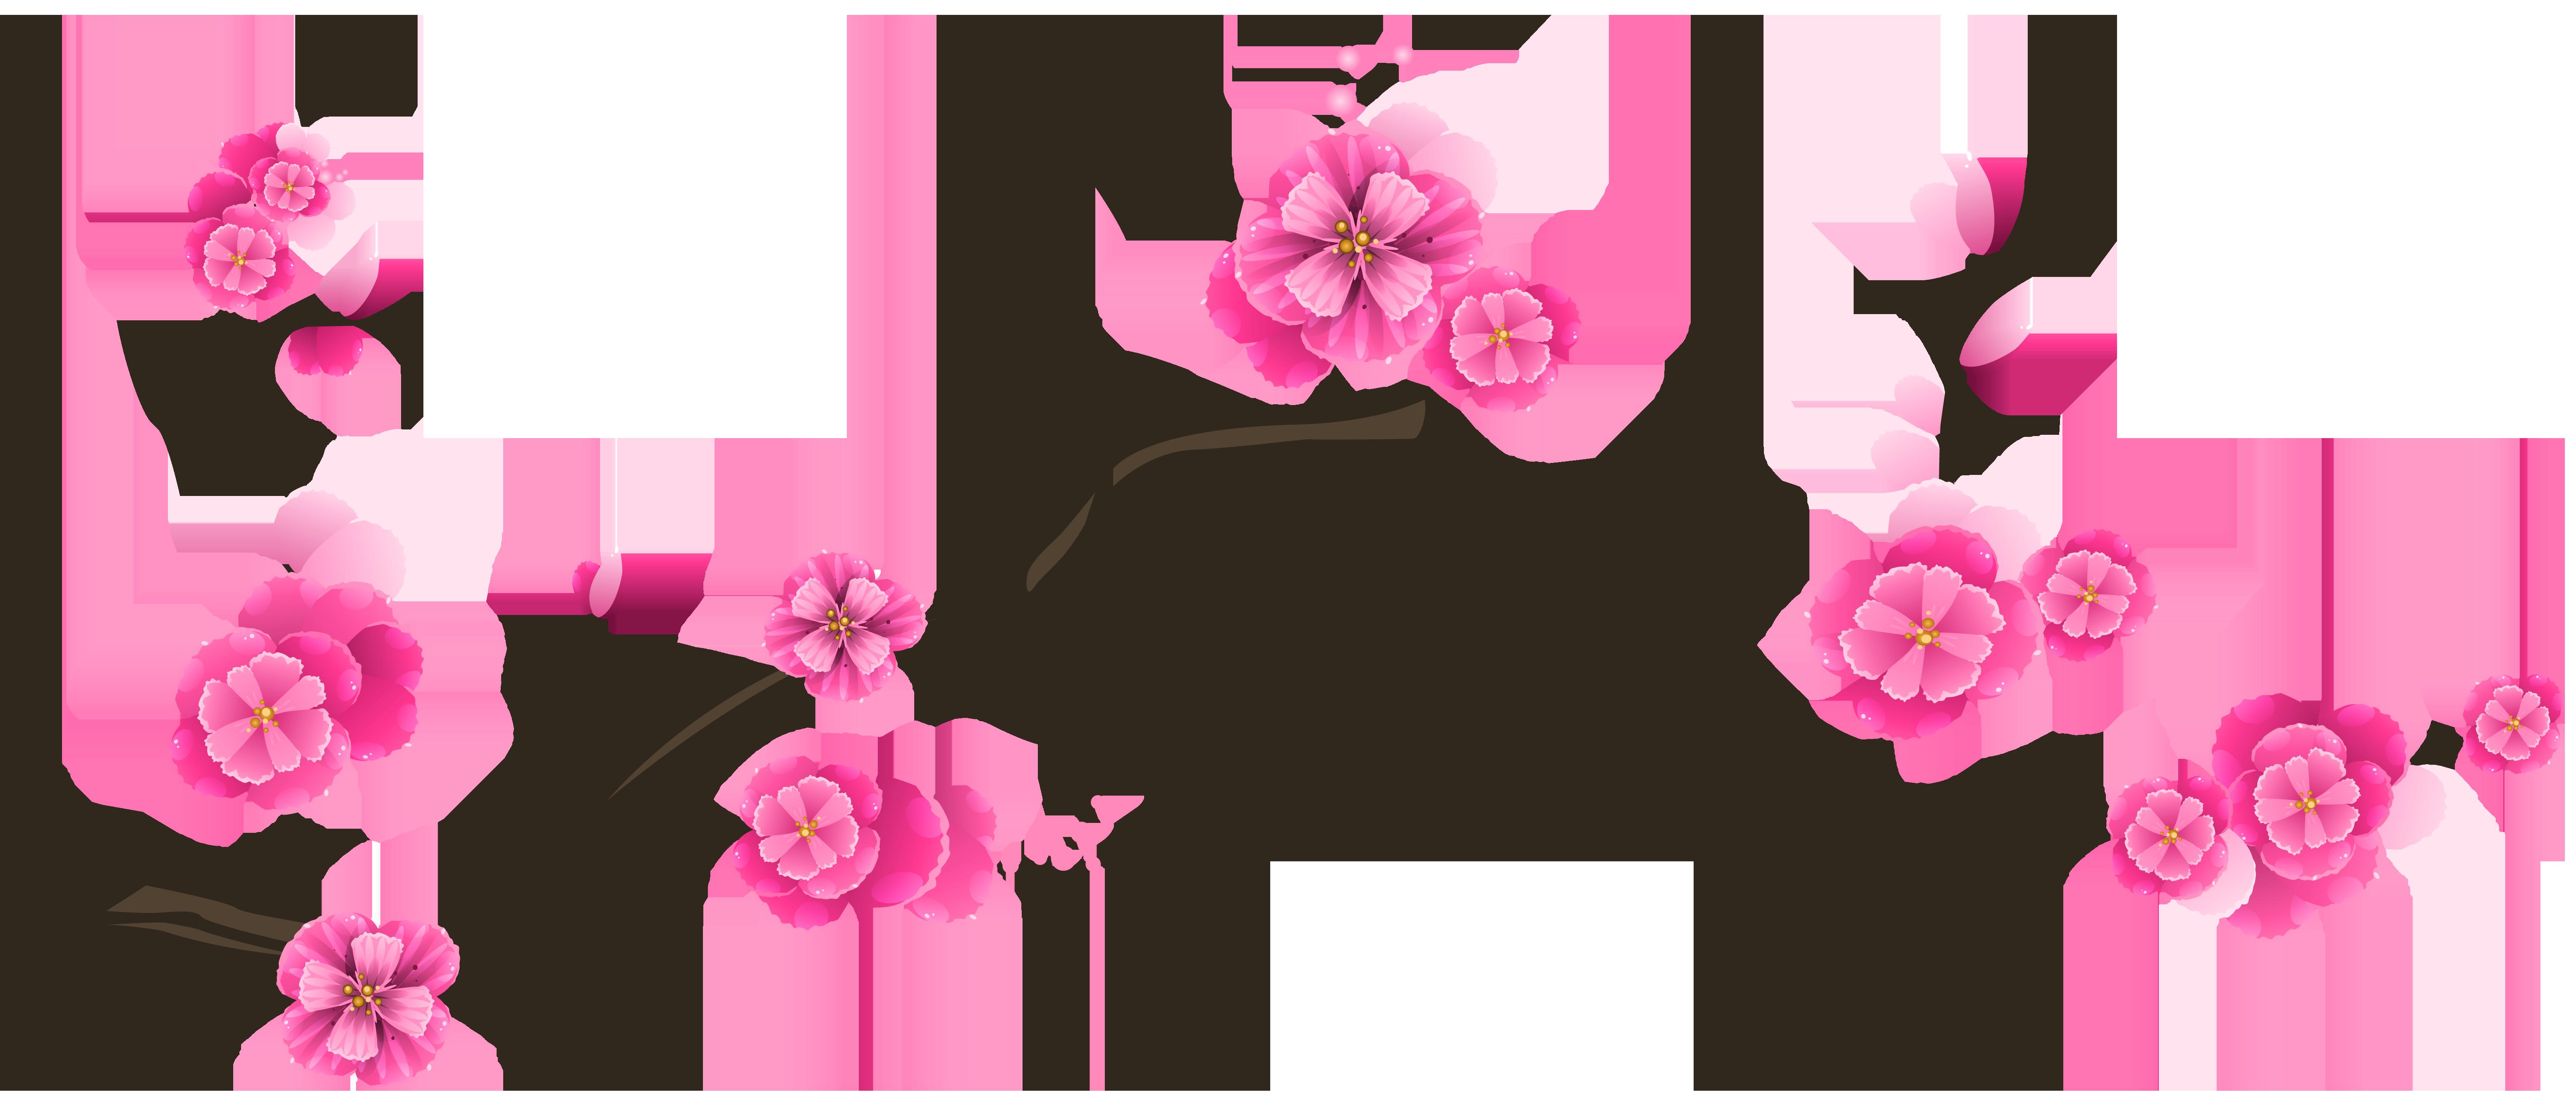 Sakura Branch Transparent Clip Art Image.